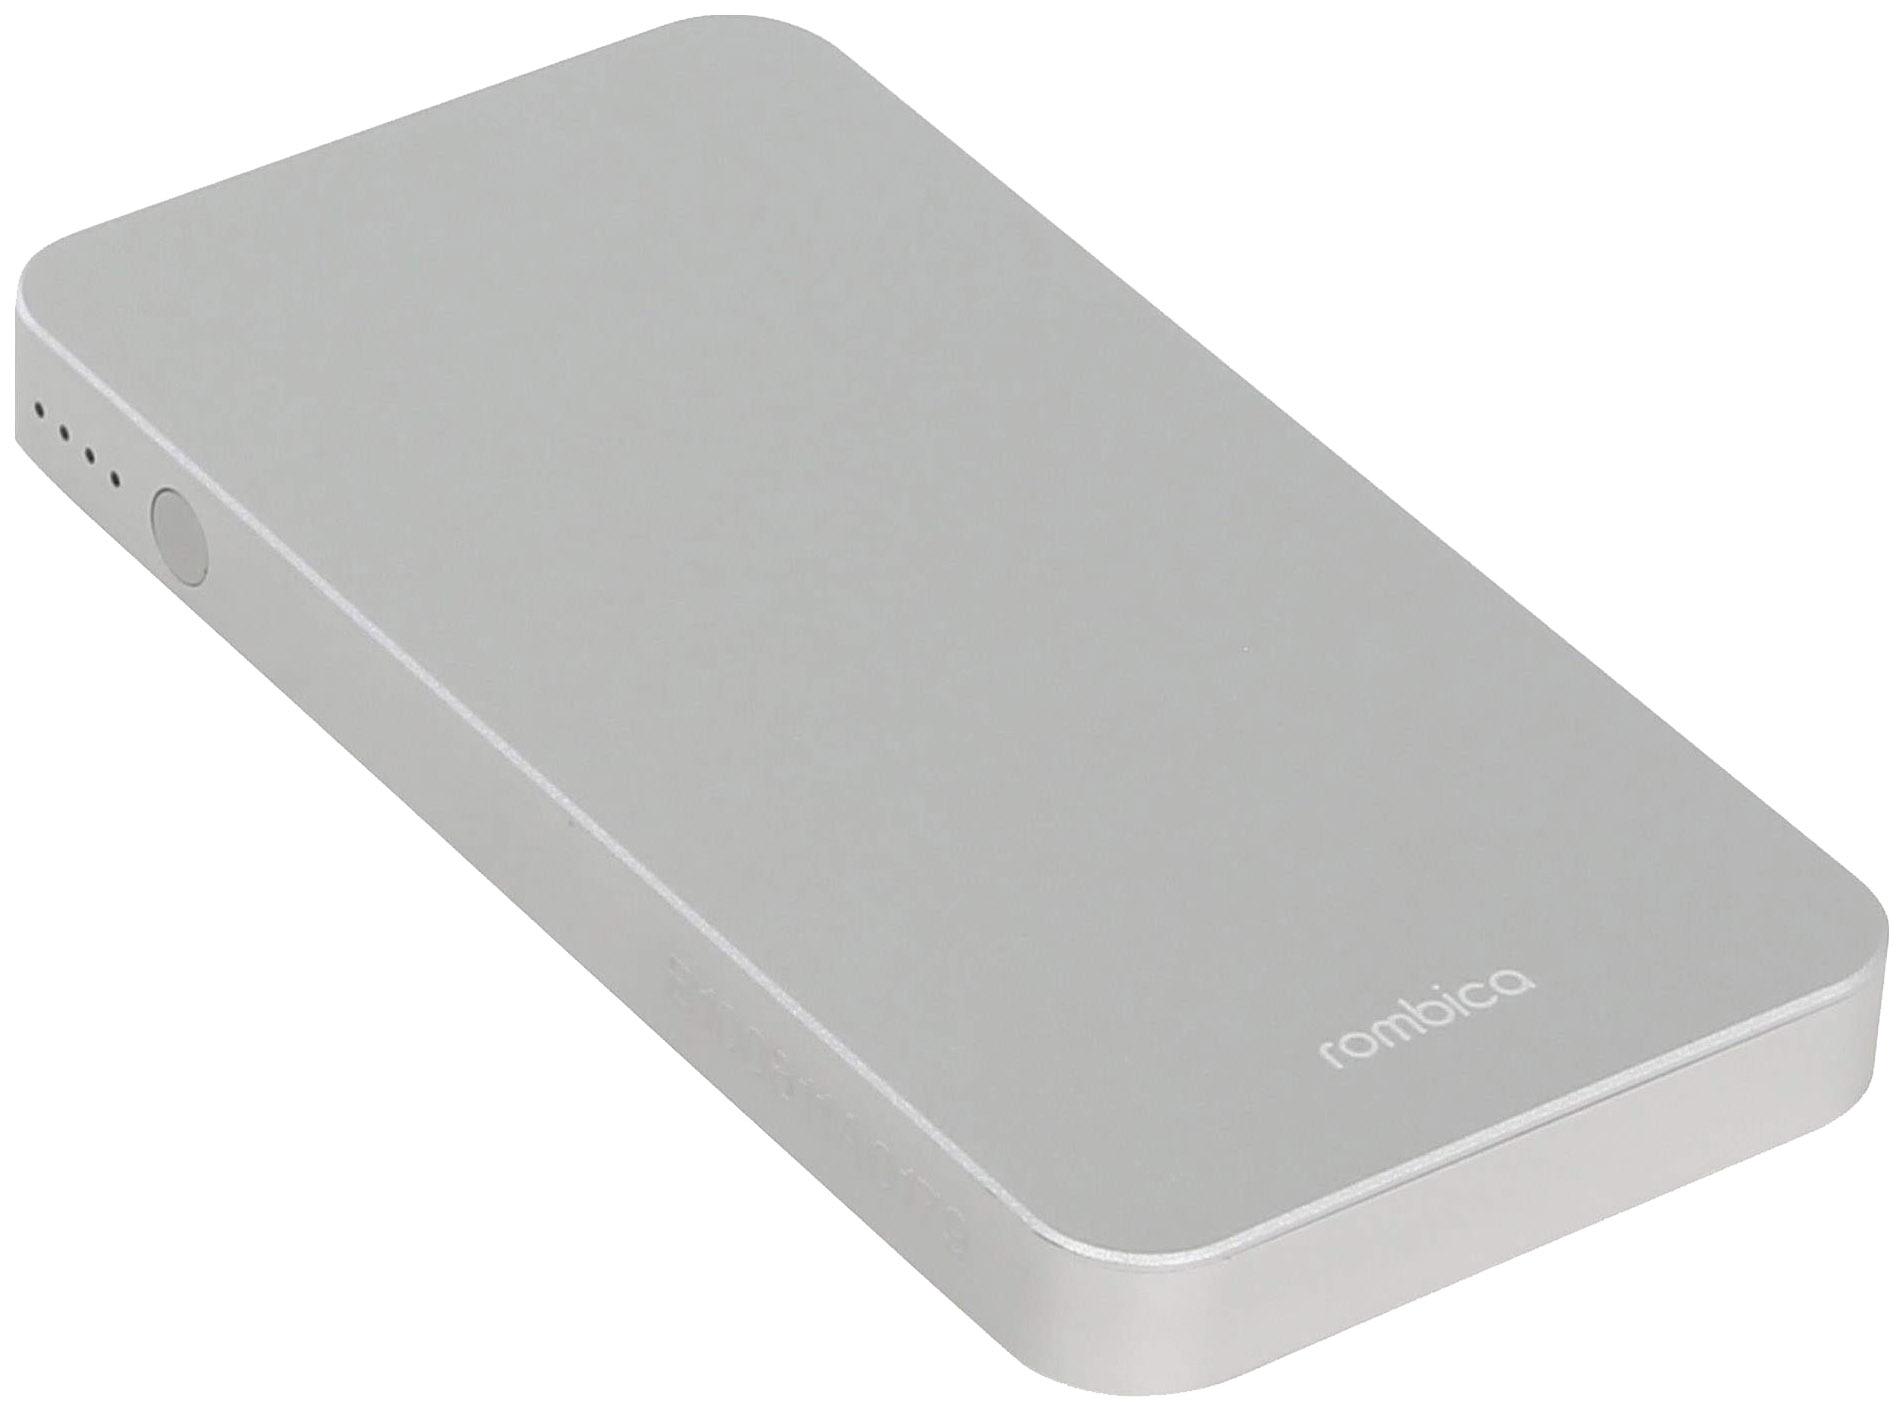 Внешний аккумулятор Rombica Neo MA50 5000 мА/ч